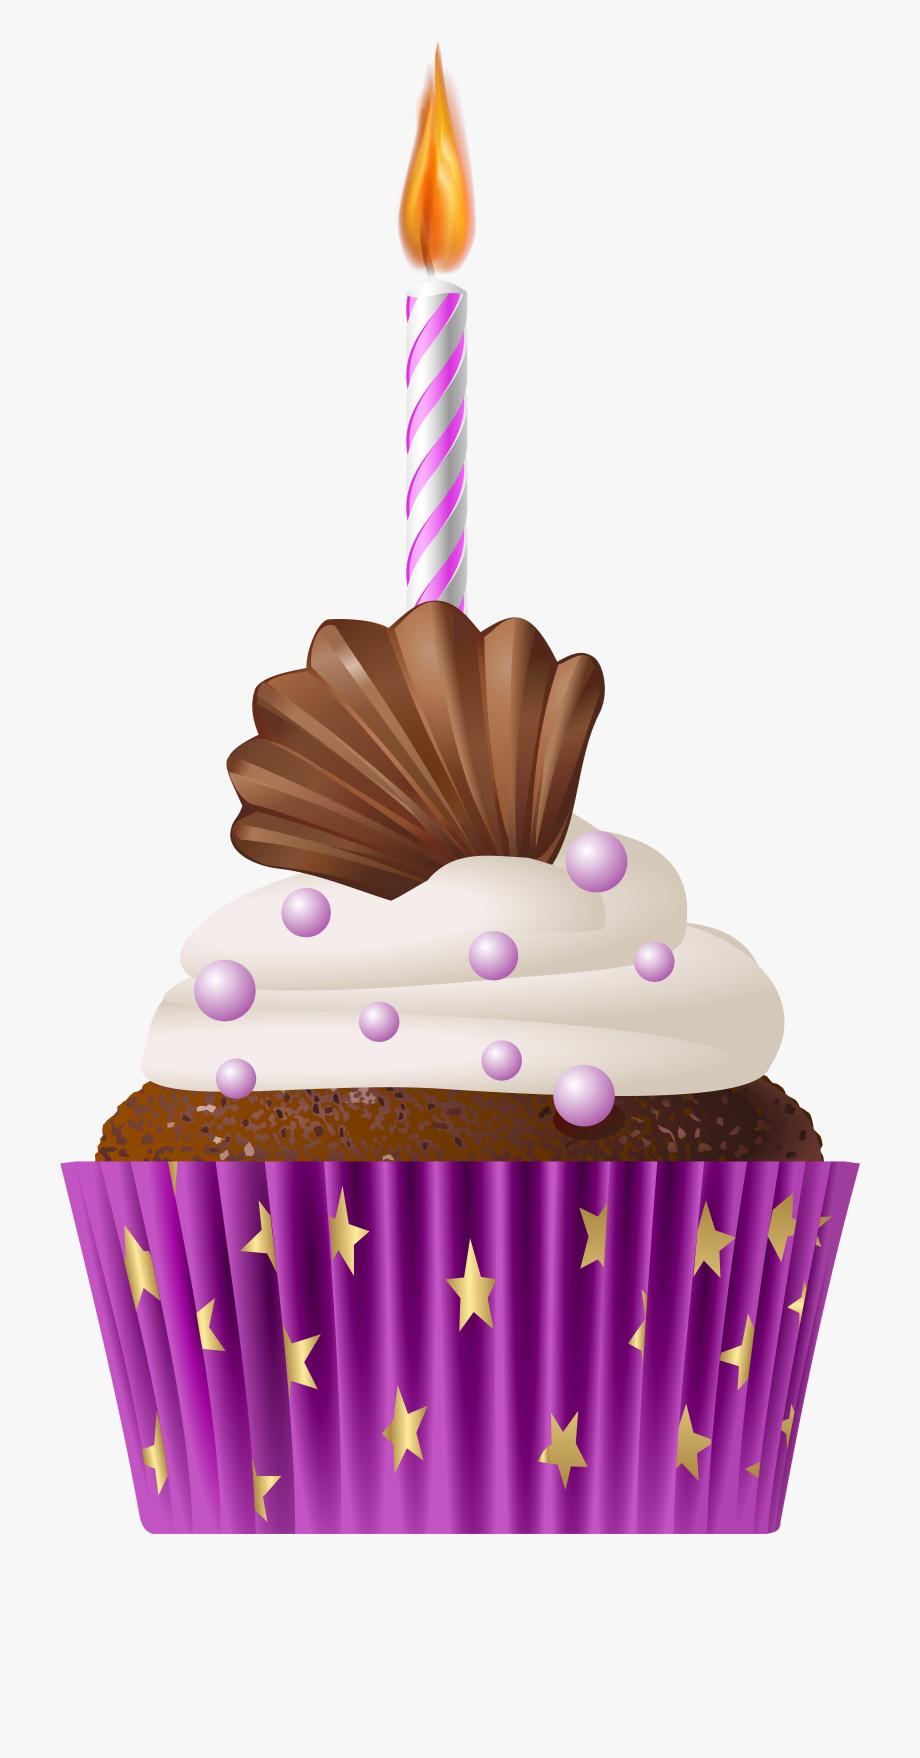 Cupcakes Clipart Happy Birthday.